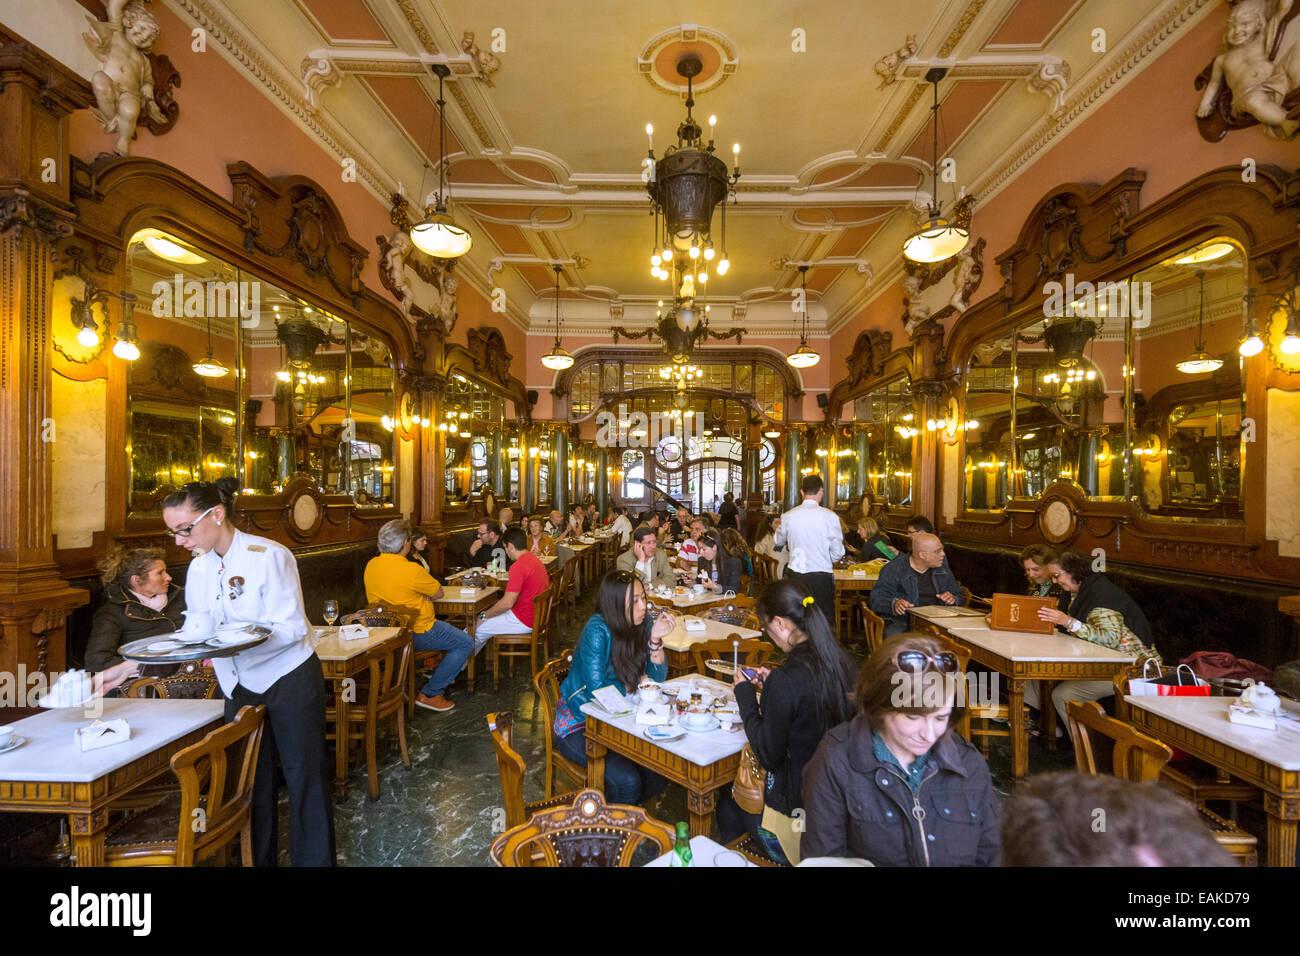 Café Majestic, Art Nouveau cafe, tavern, restaurant dining, Porto, District of Porto, Portugal - Stock Image